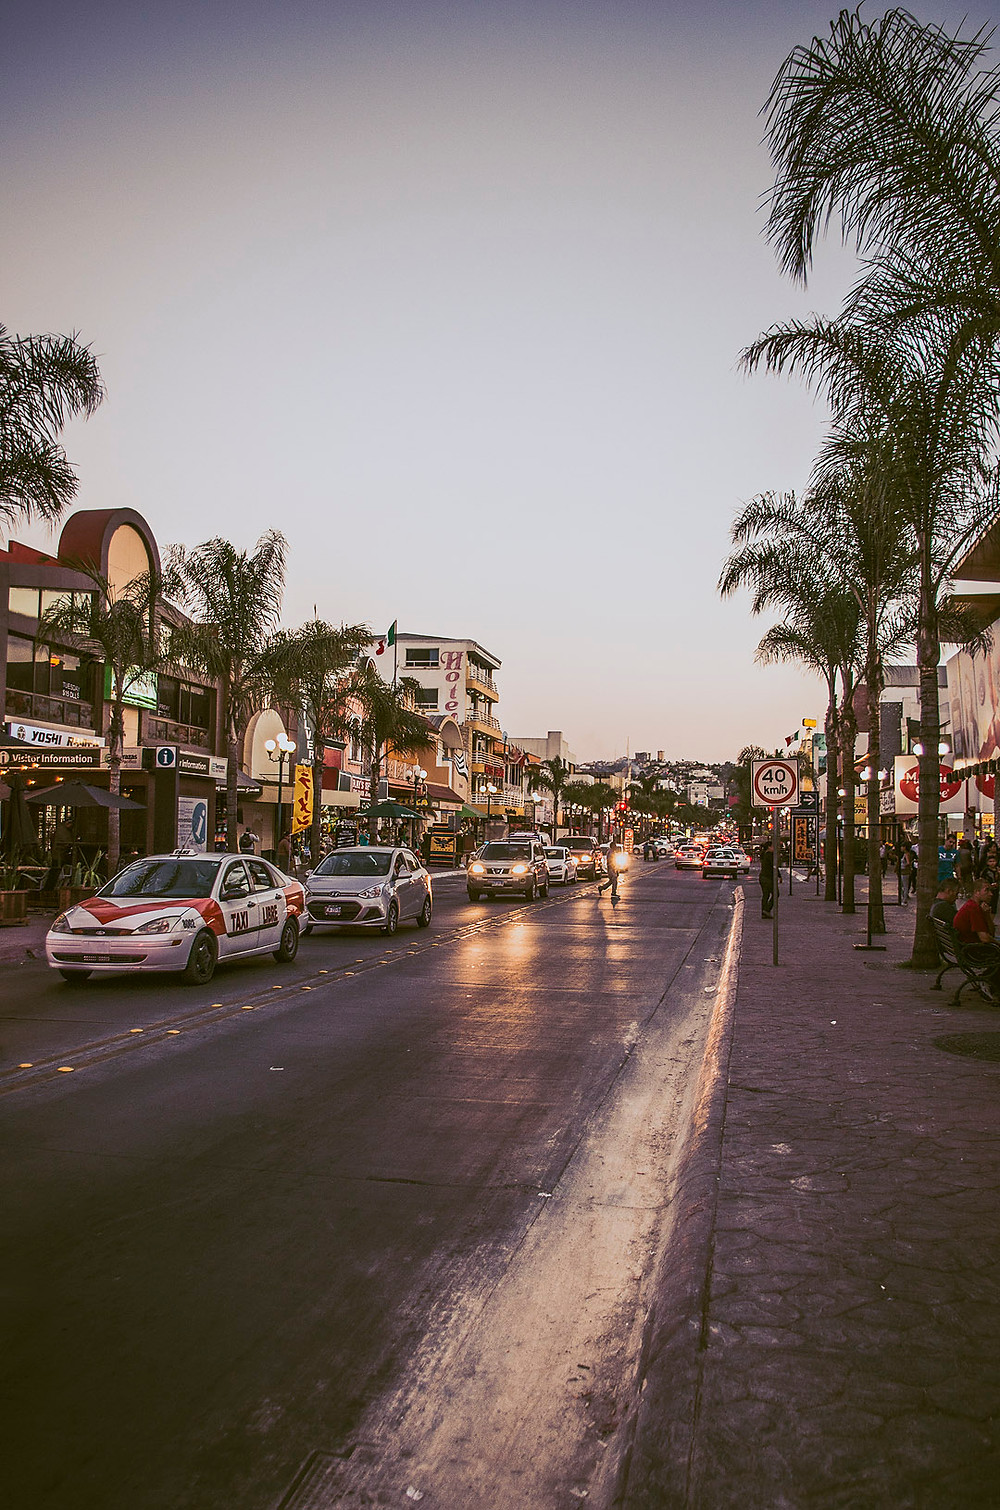 Tijuana streets at night